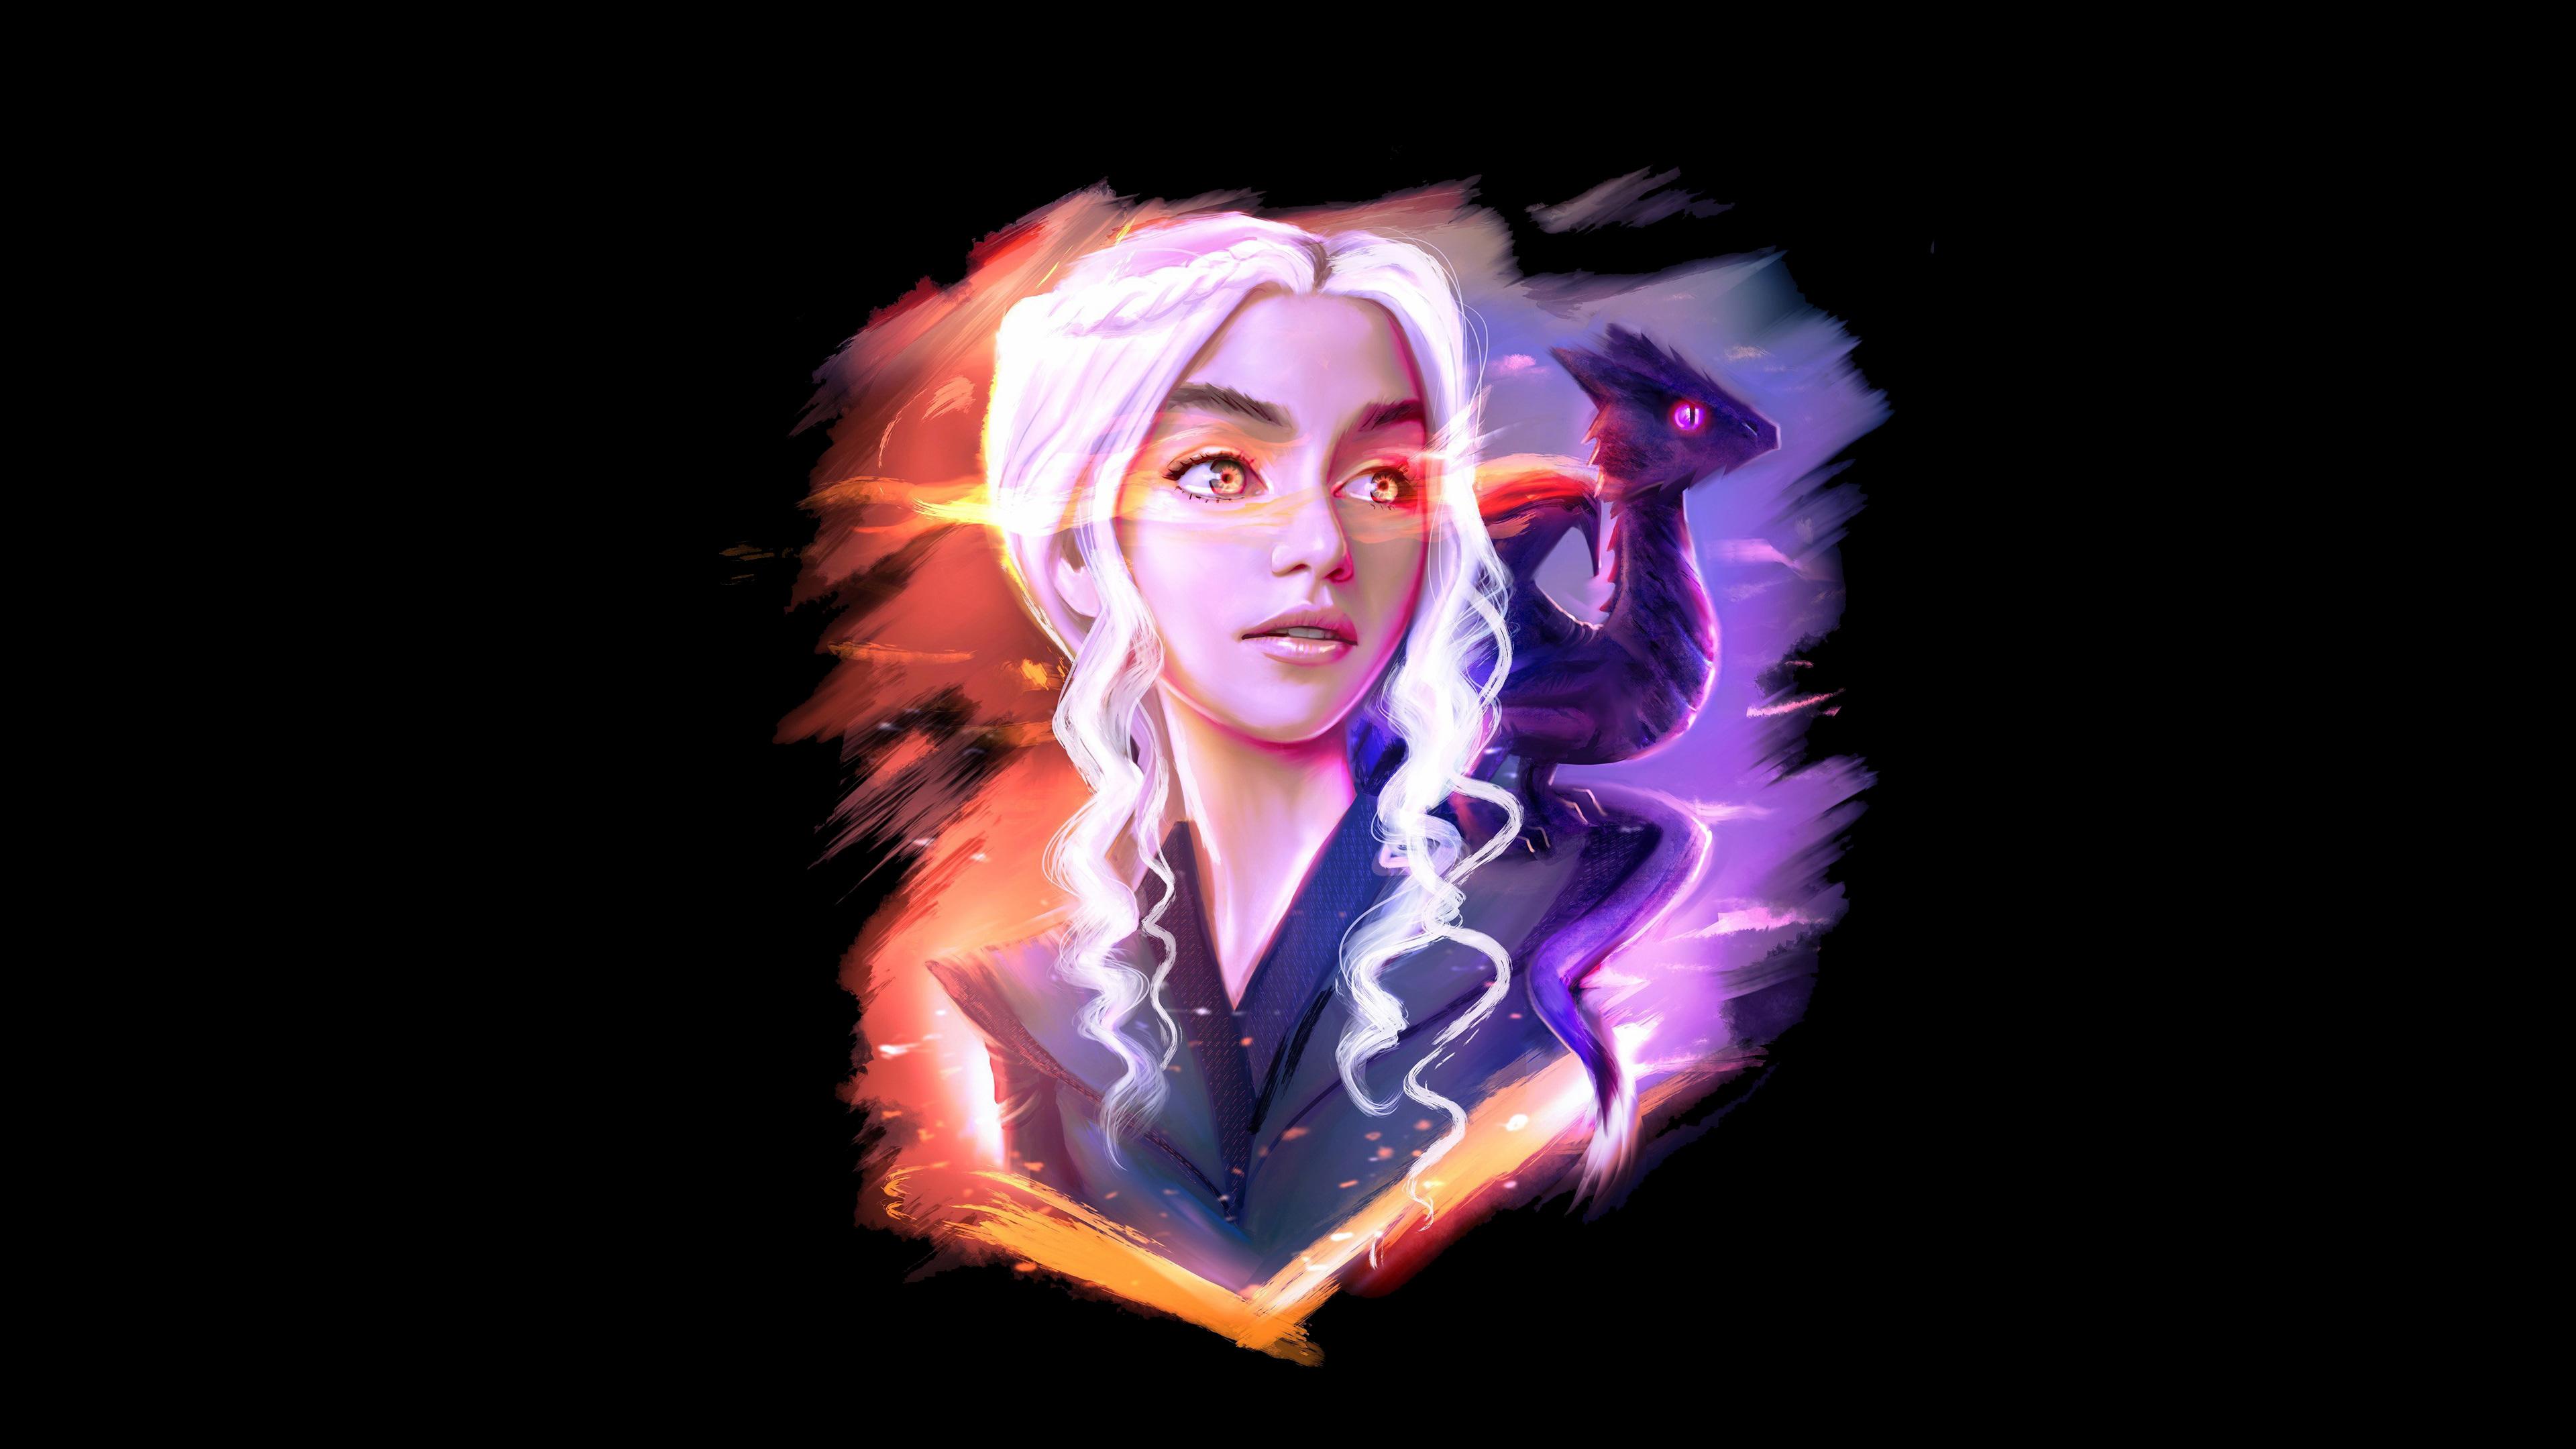 Wallpaper 4k Daenerys Targaryen And Dragon Fan Art 4k Artist